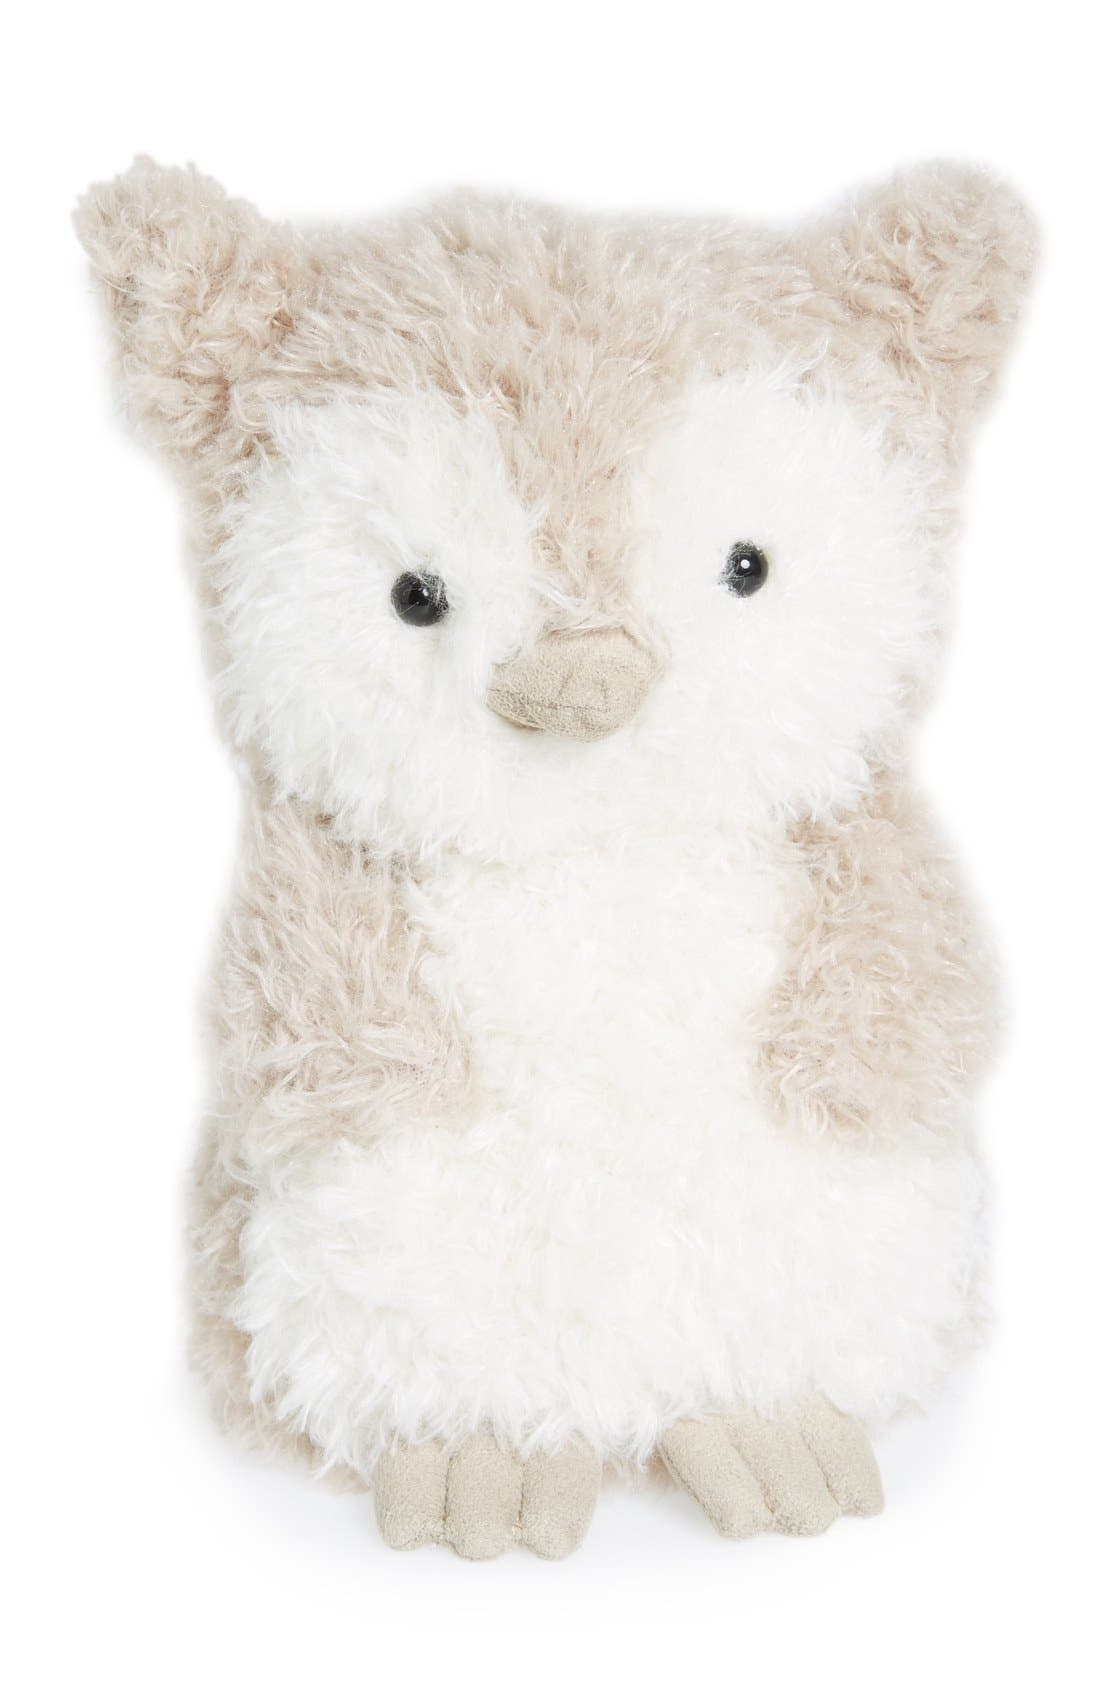 Jellycat 'Wake Up Little Owl' Stuffed Animal